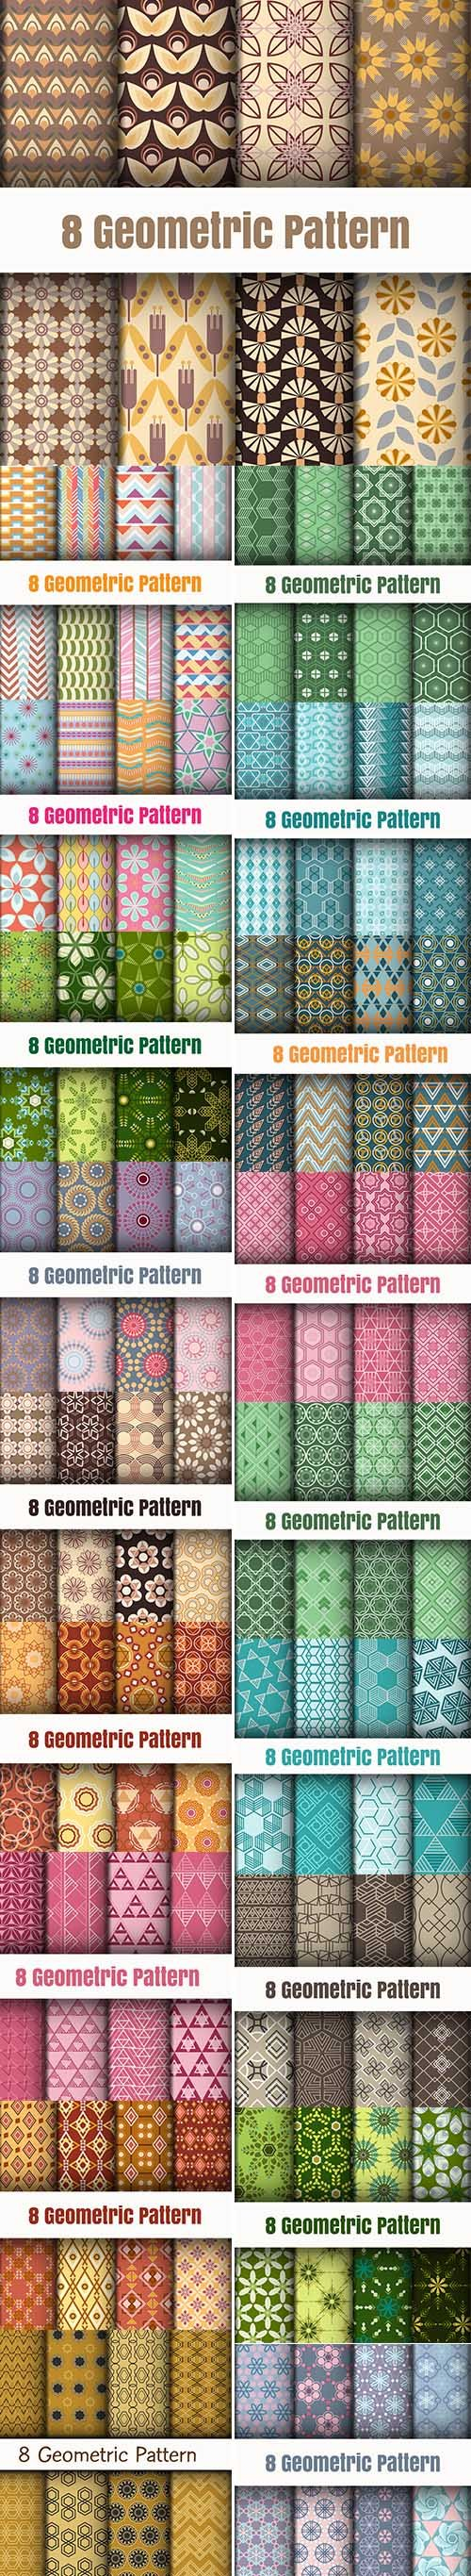 Geometric Pattern Background Pack